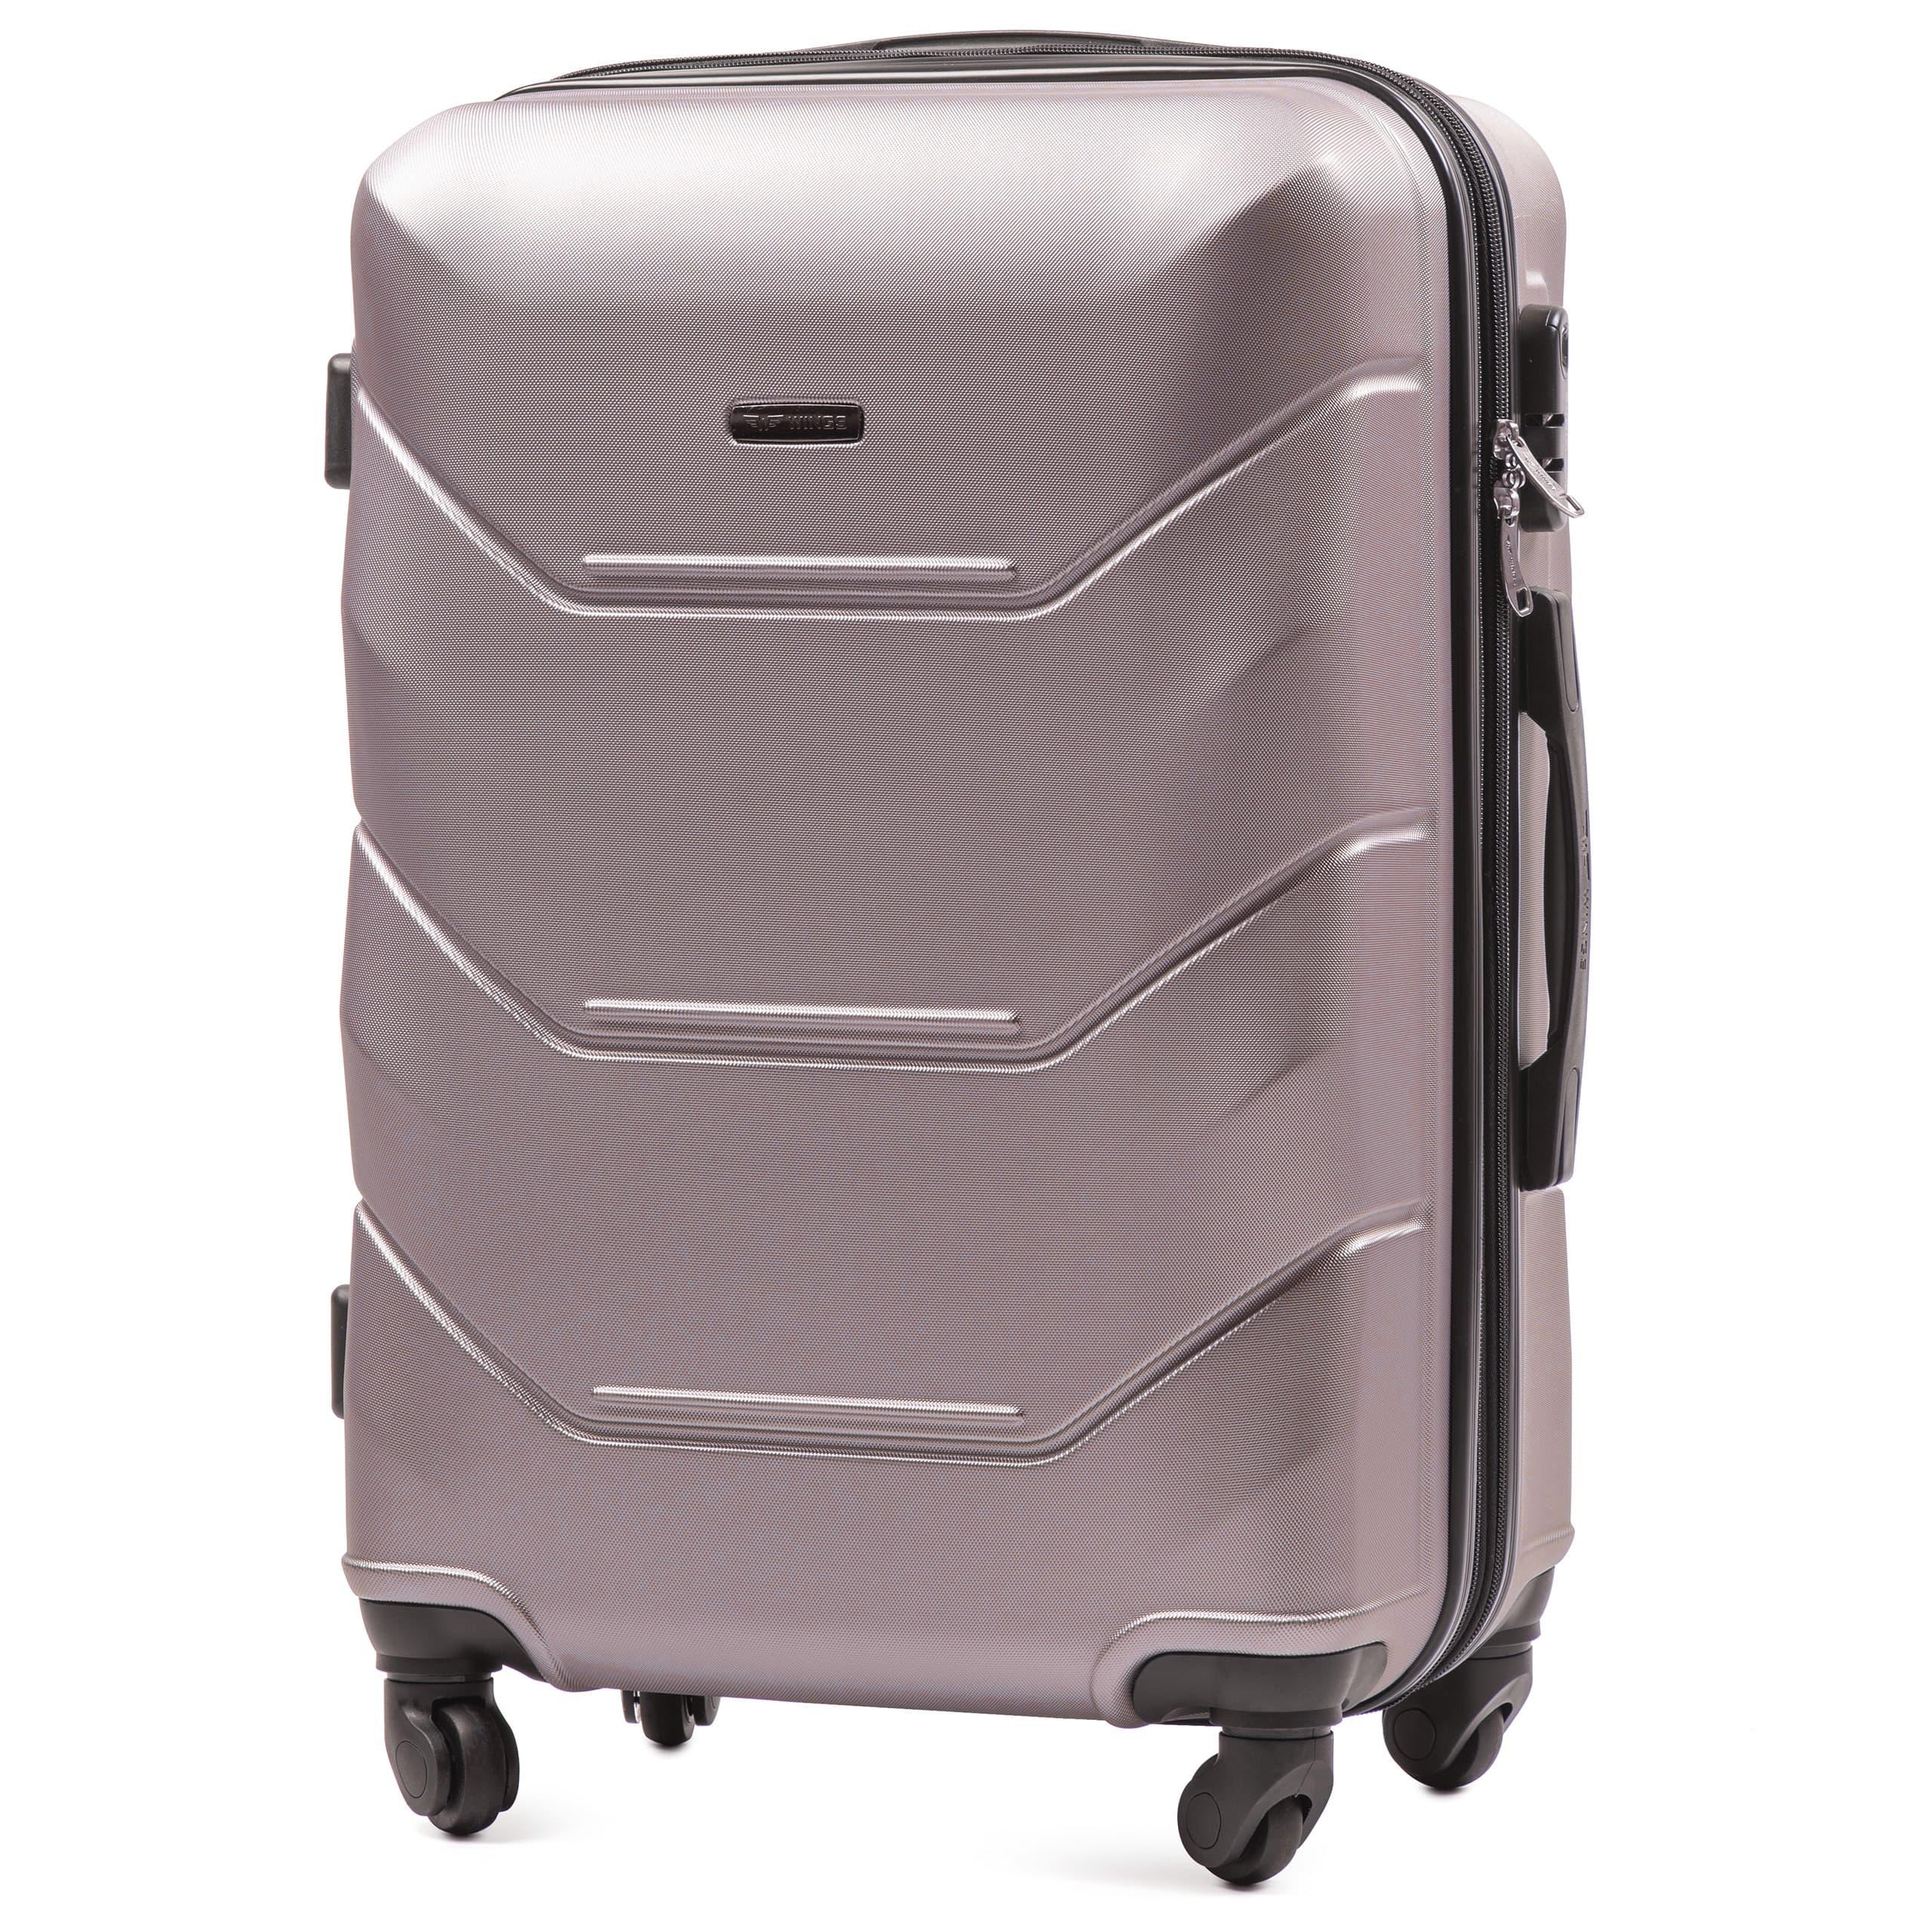 СРЕДНИЙ ЧЕМОДАН WINGS 147 M ROSE GOLD  PREMIUM НА 4-Х КАУЧУКОВЫХ КОЛЕСАХ!Для багажа ,до 18 кг